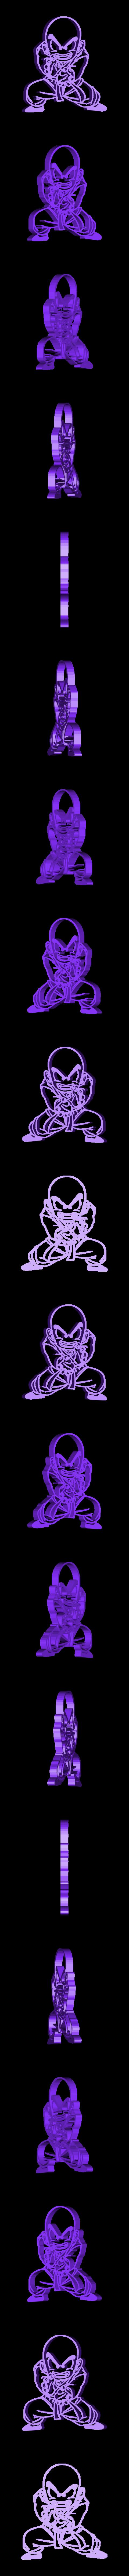 Powerful Krunk.stl Télécharger fichier STL gratuit Dragon Ball Krilin,Goku x3 cutters • Design imprimable en 3D, bboy_born22